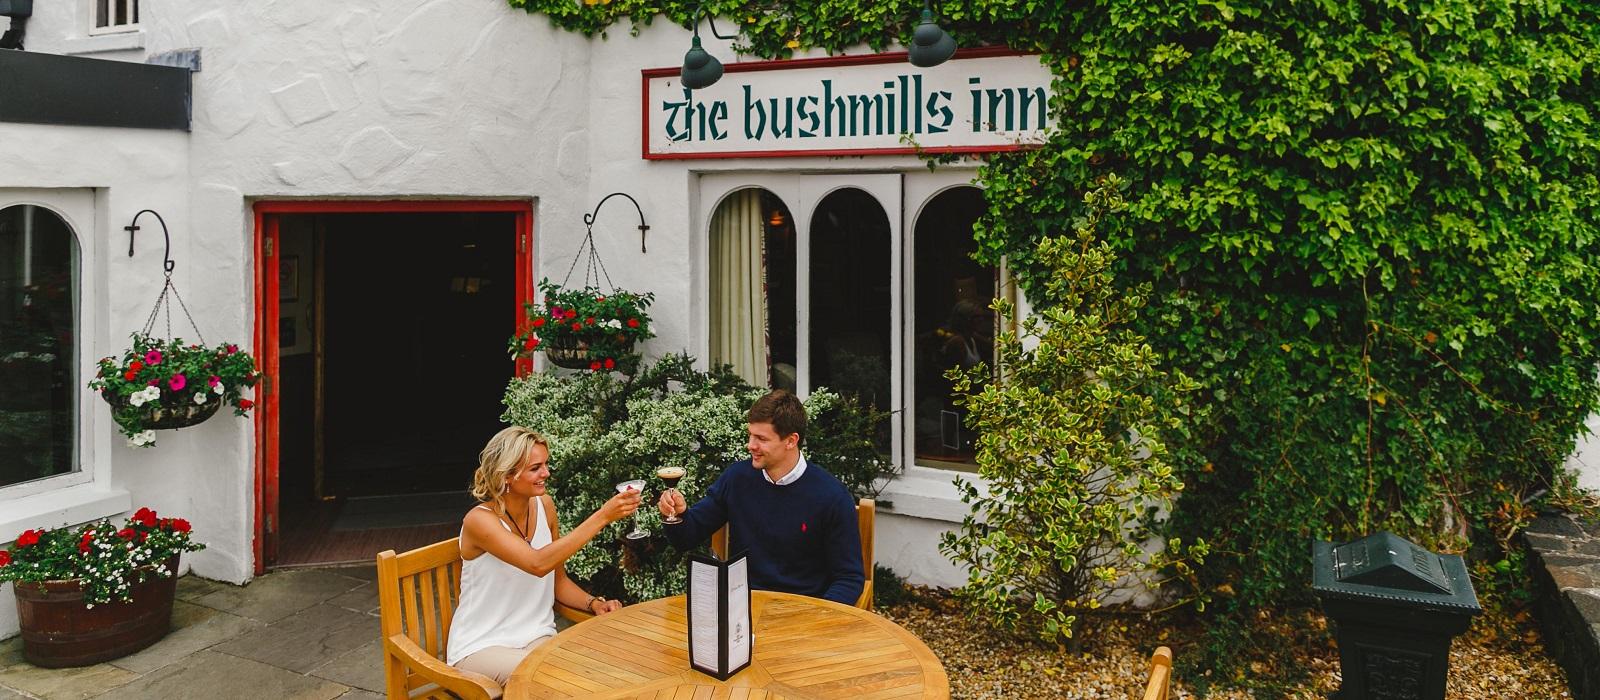 Bushmills Inn Hotels Antrim Hotel Belfast Historic